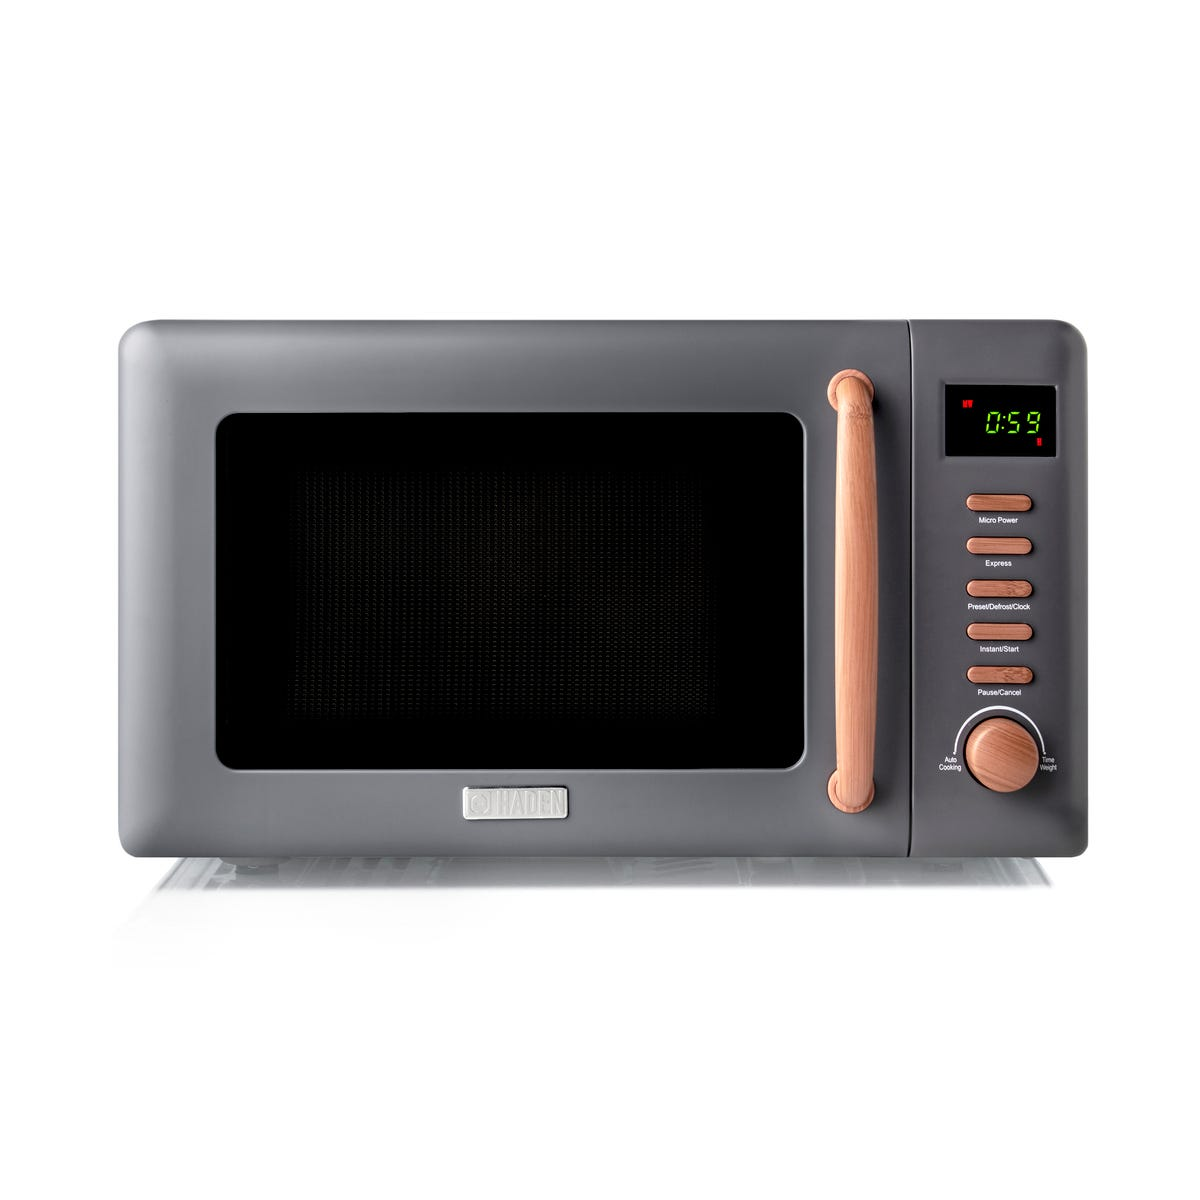 Haden 201324 Dorchester 20L 800W Microwave - Pebble Grey